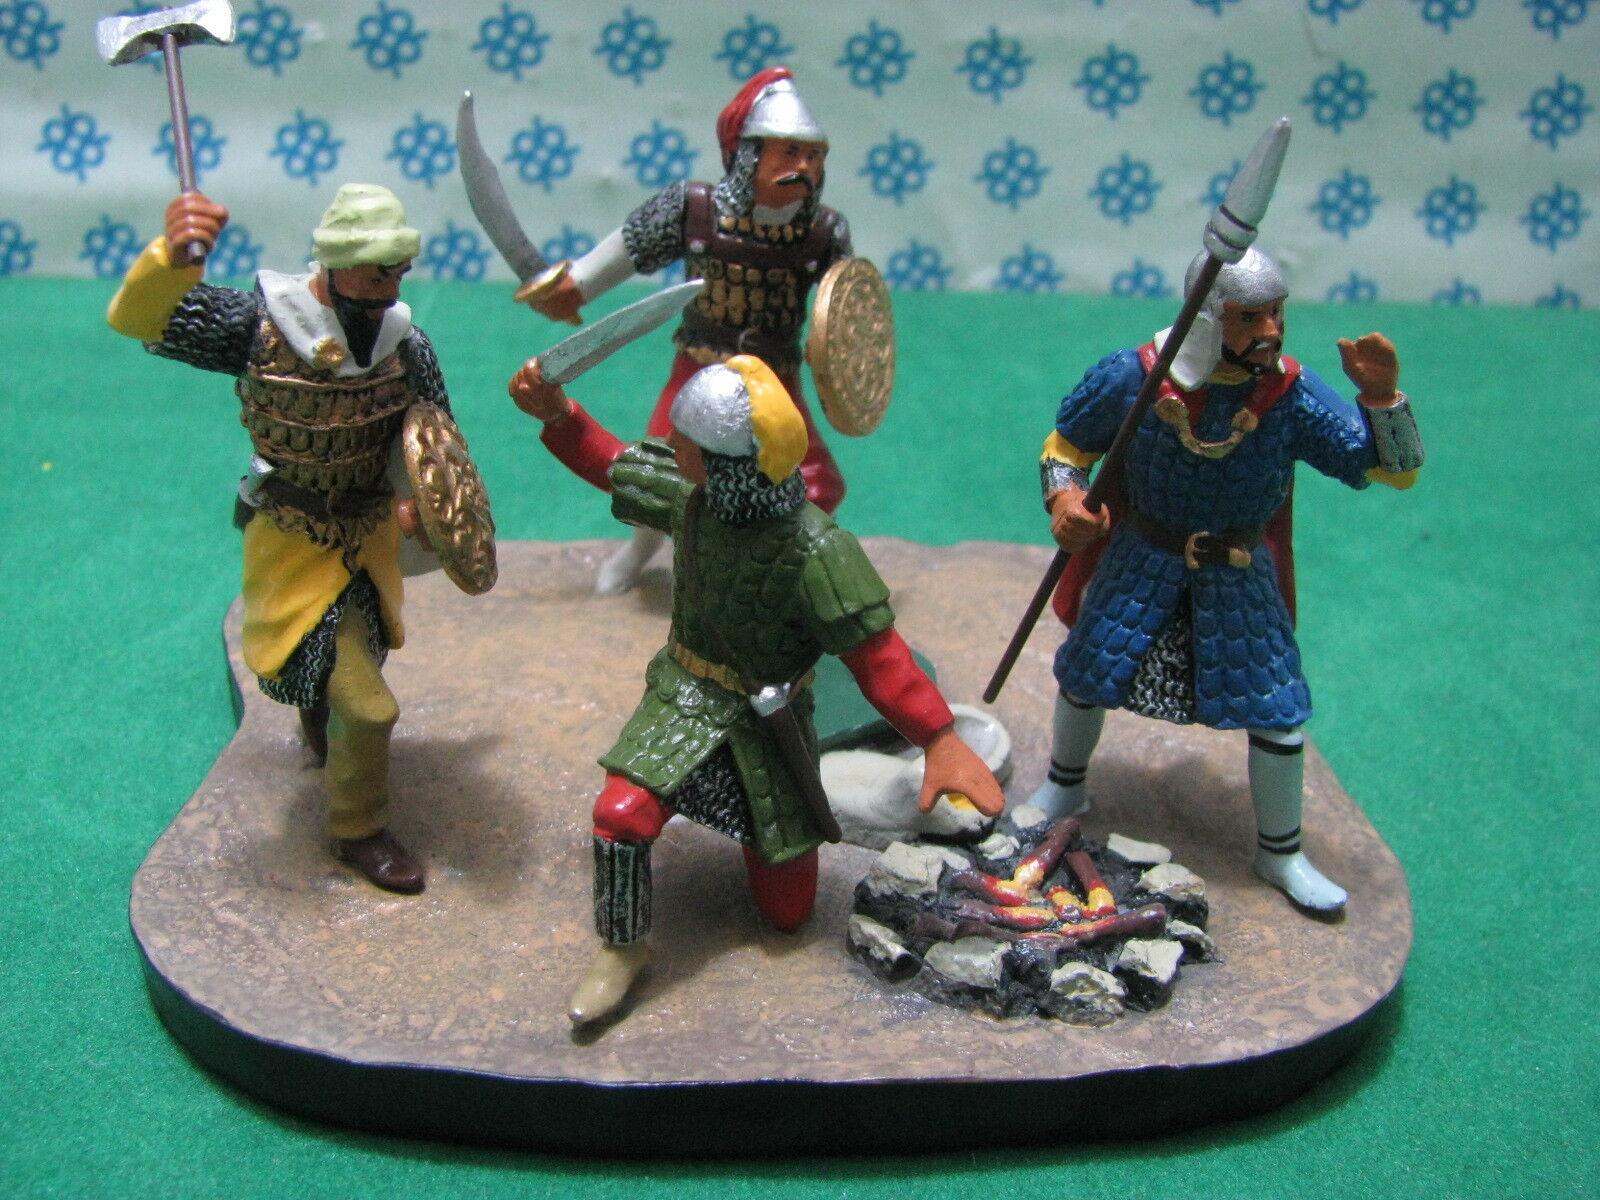 RITTER   Medioevali  Diorama  4 figure con fuoco - metal toy soldier figure se